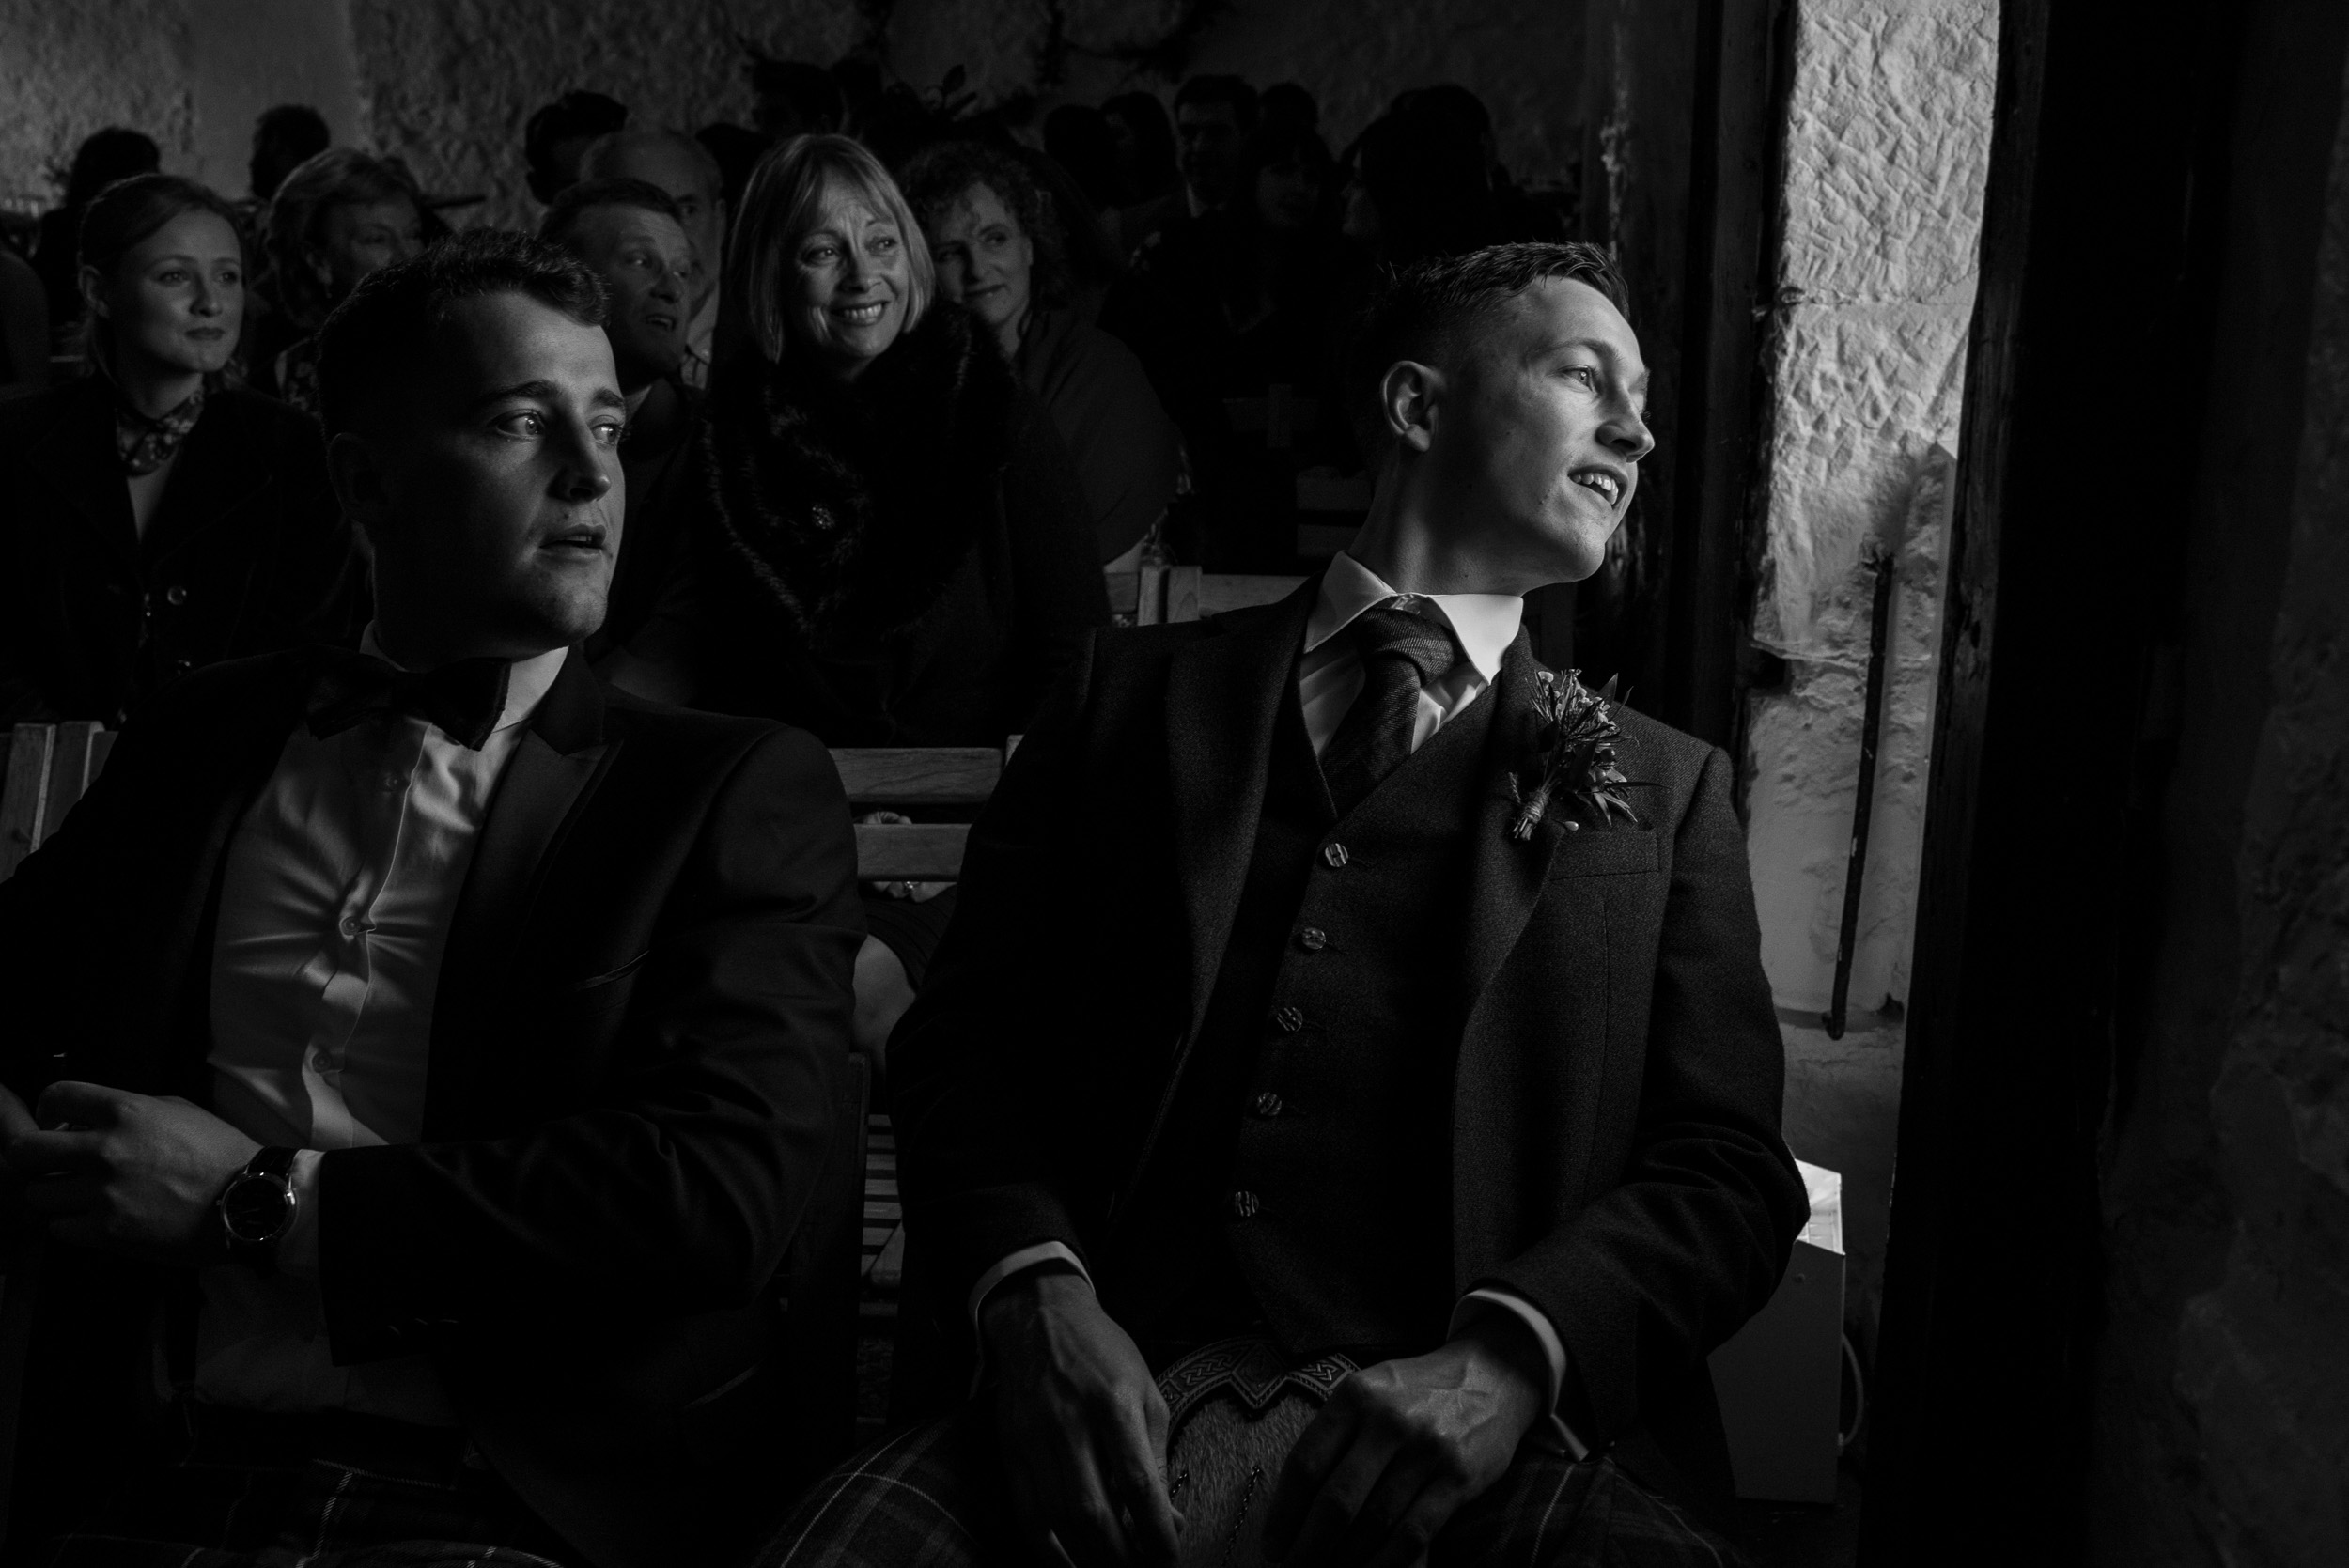 Awaiting wedding ceremony